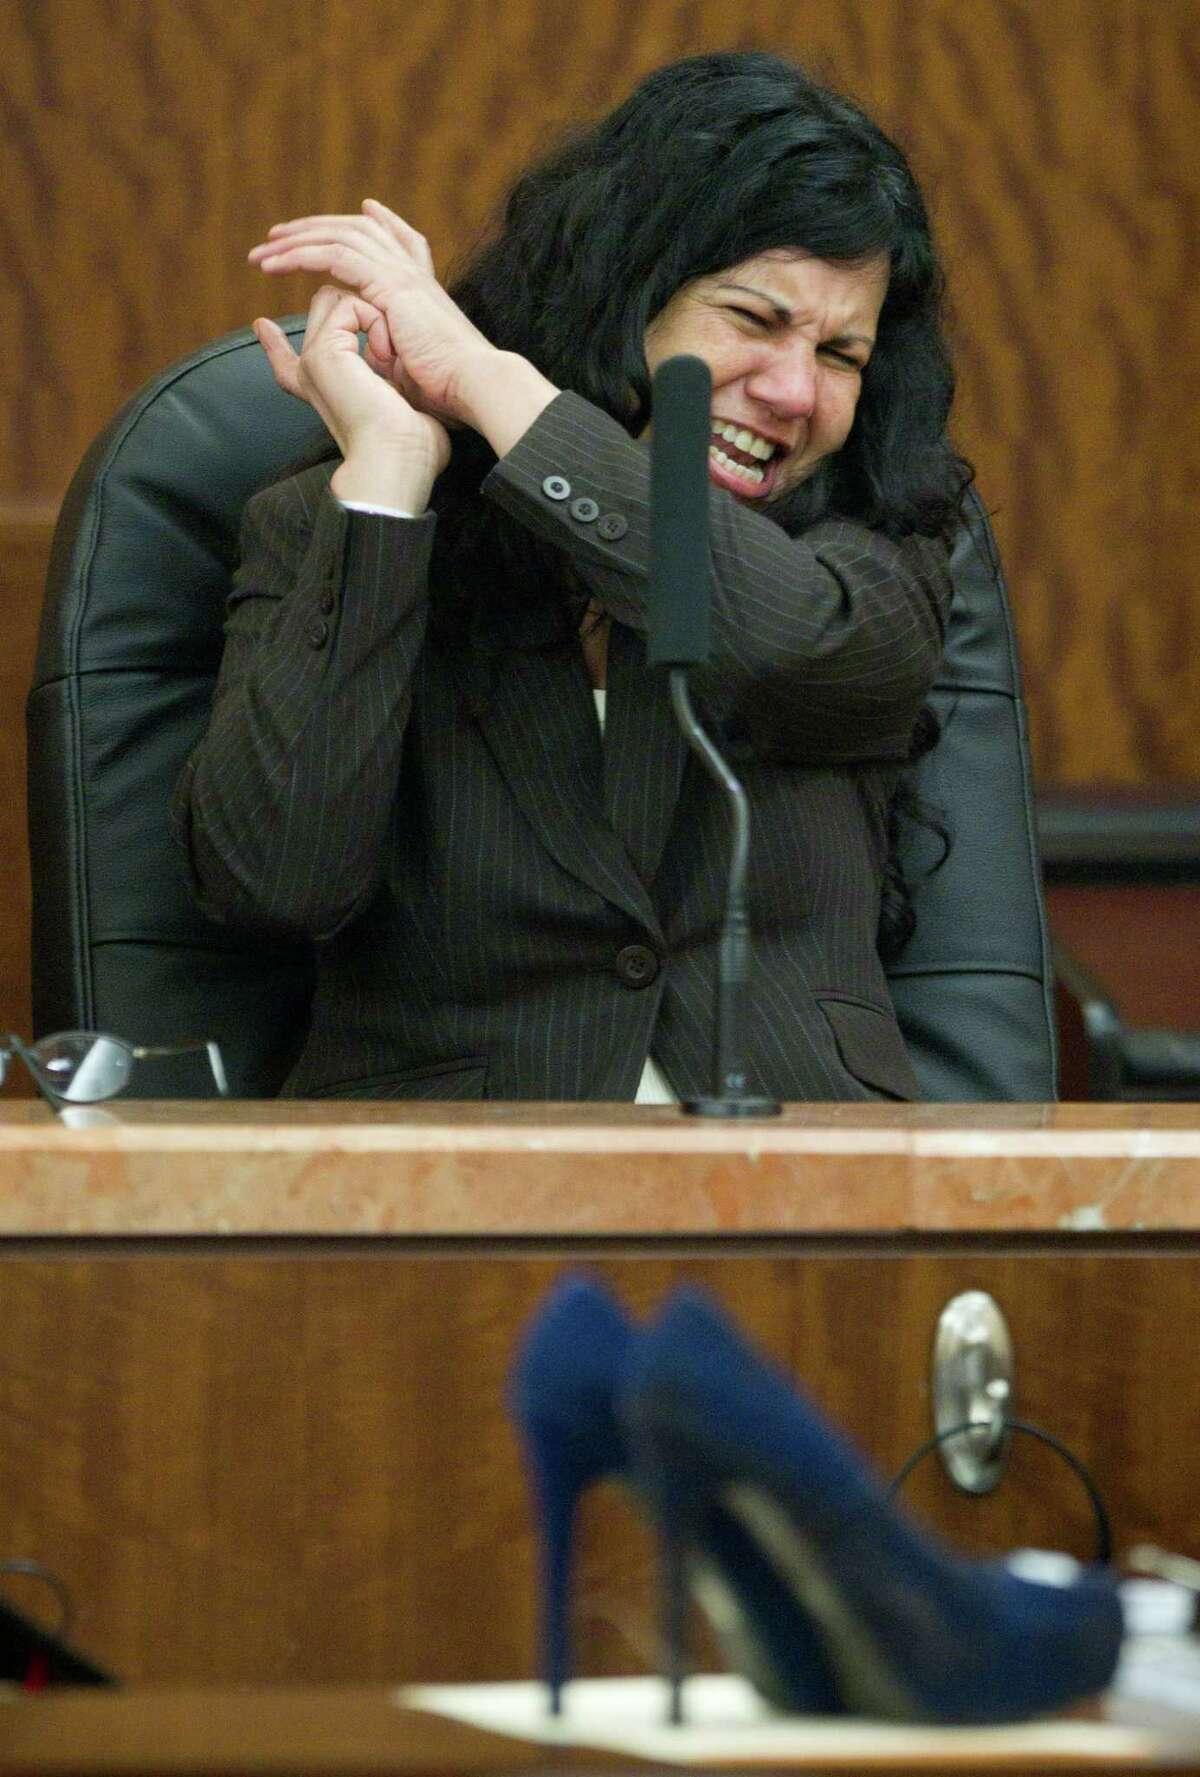 STILETTO KILLER June 9, 2013 Jurors sentenced Ana Trujillo, AKA the